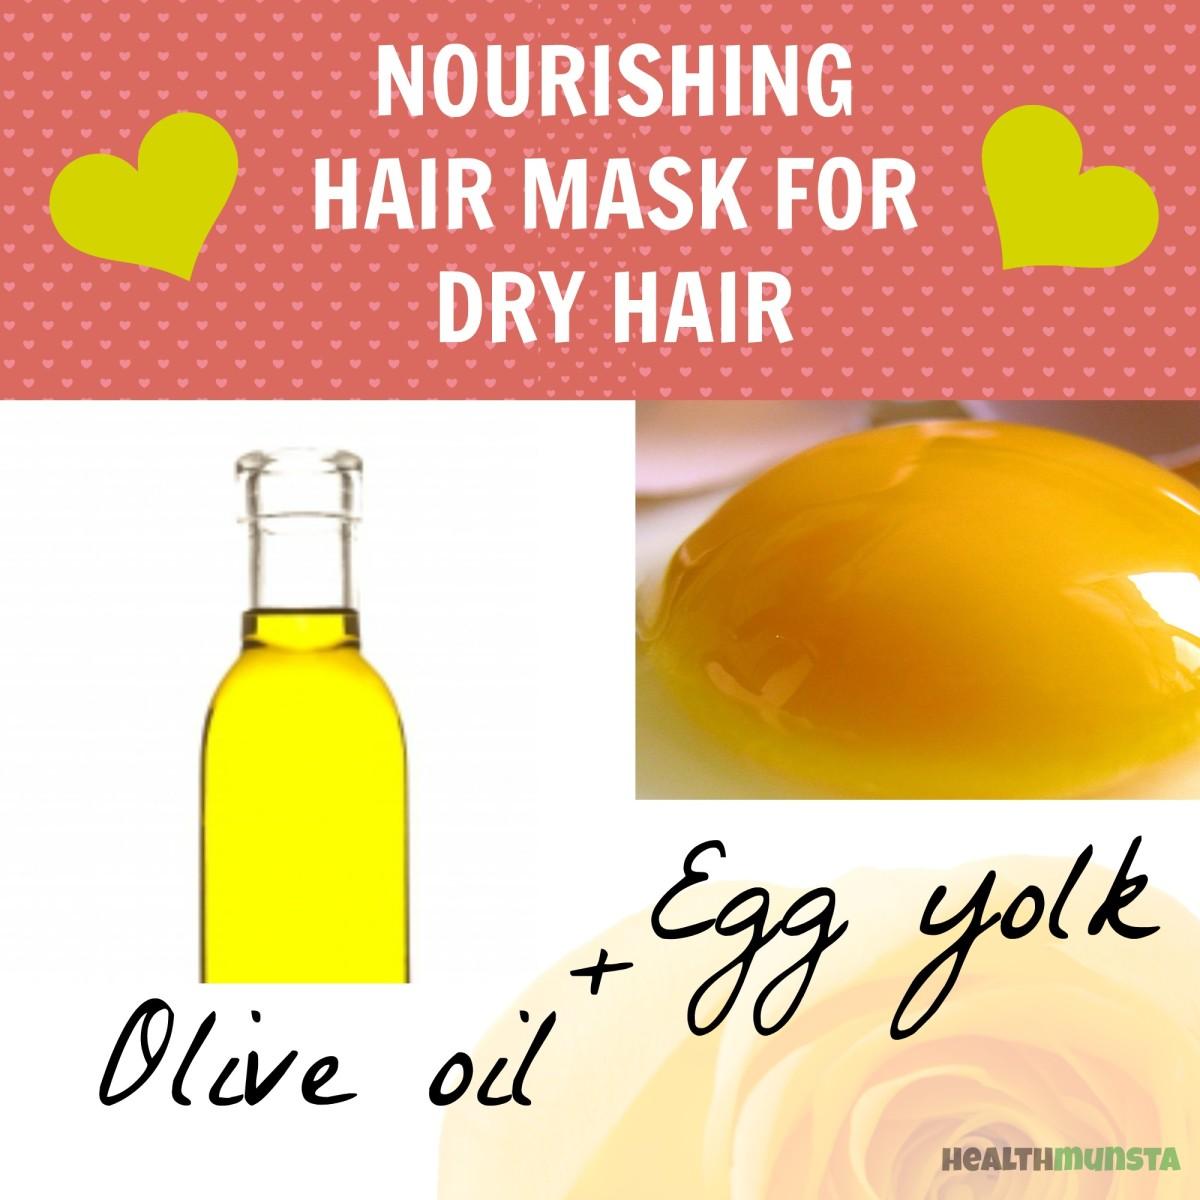 diy hair care best hair masks for dry hair. Black Bedroom Furniture Sets. Home Design Ideas